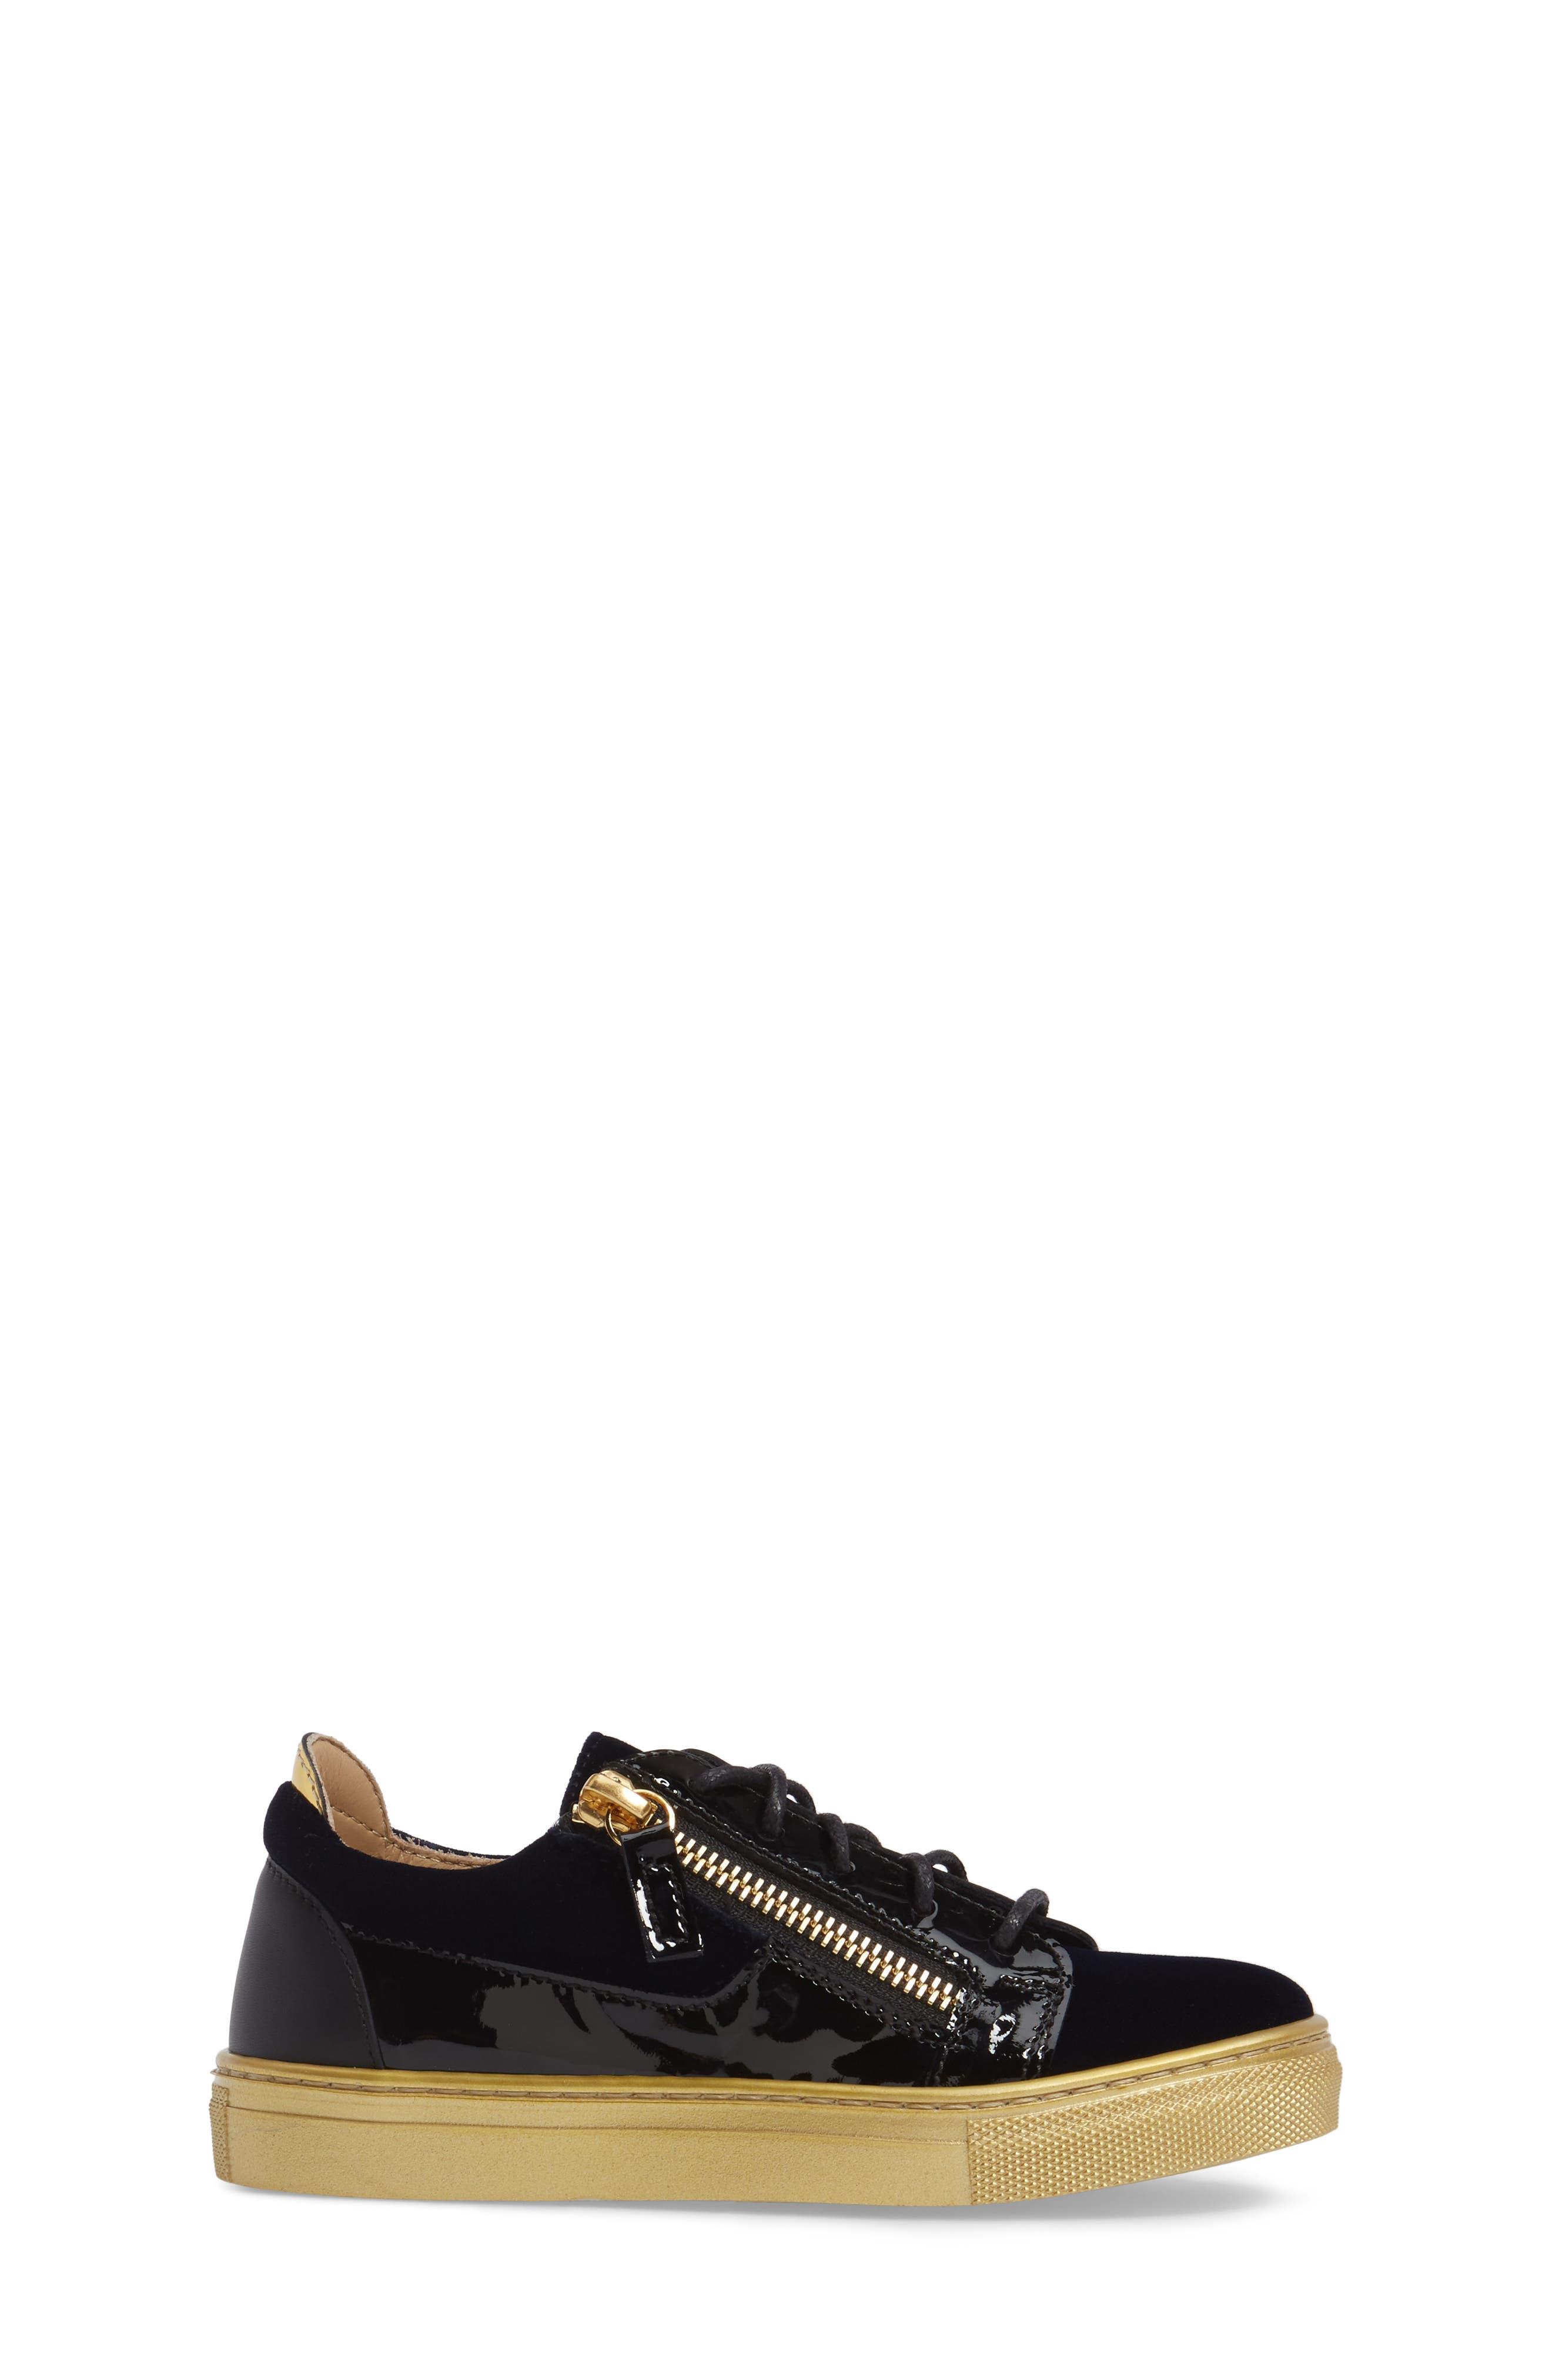 London Sneaker,                             Alternate thumbnail 3, color,                             400